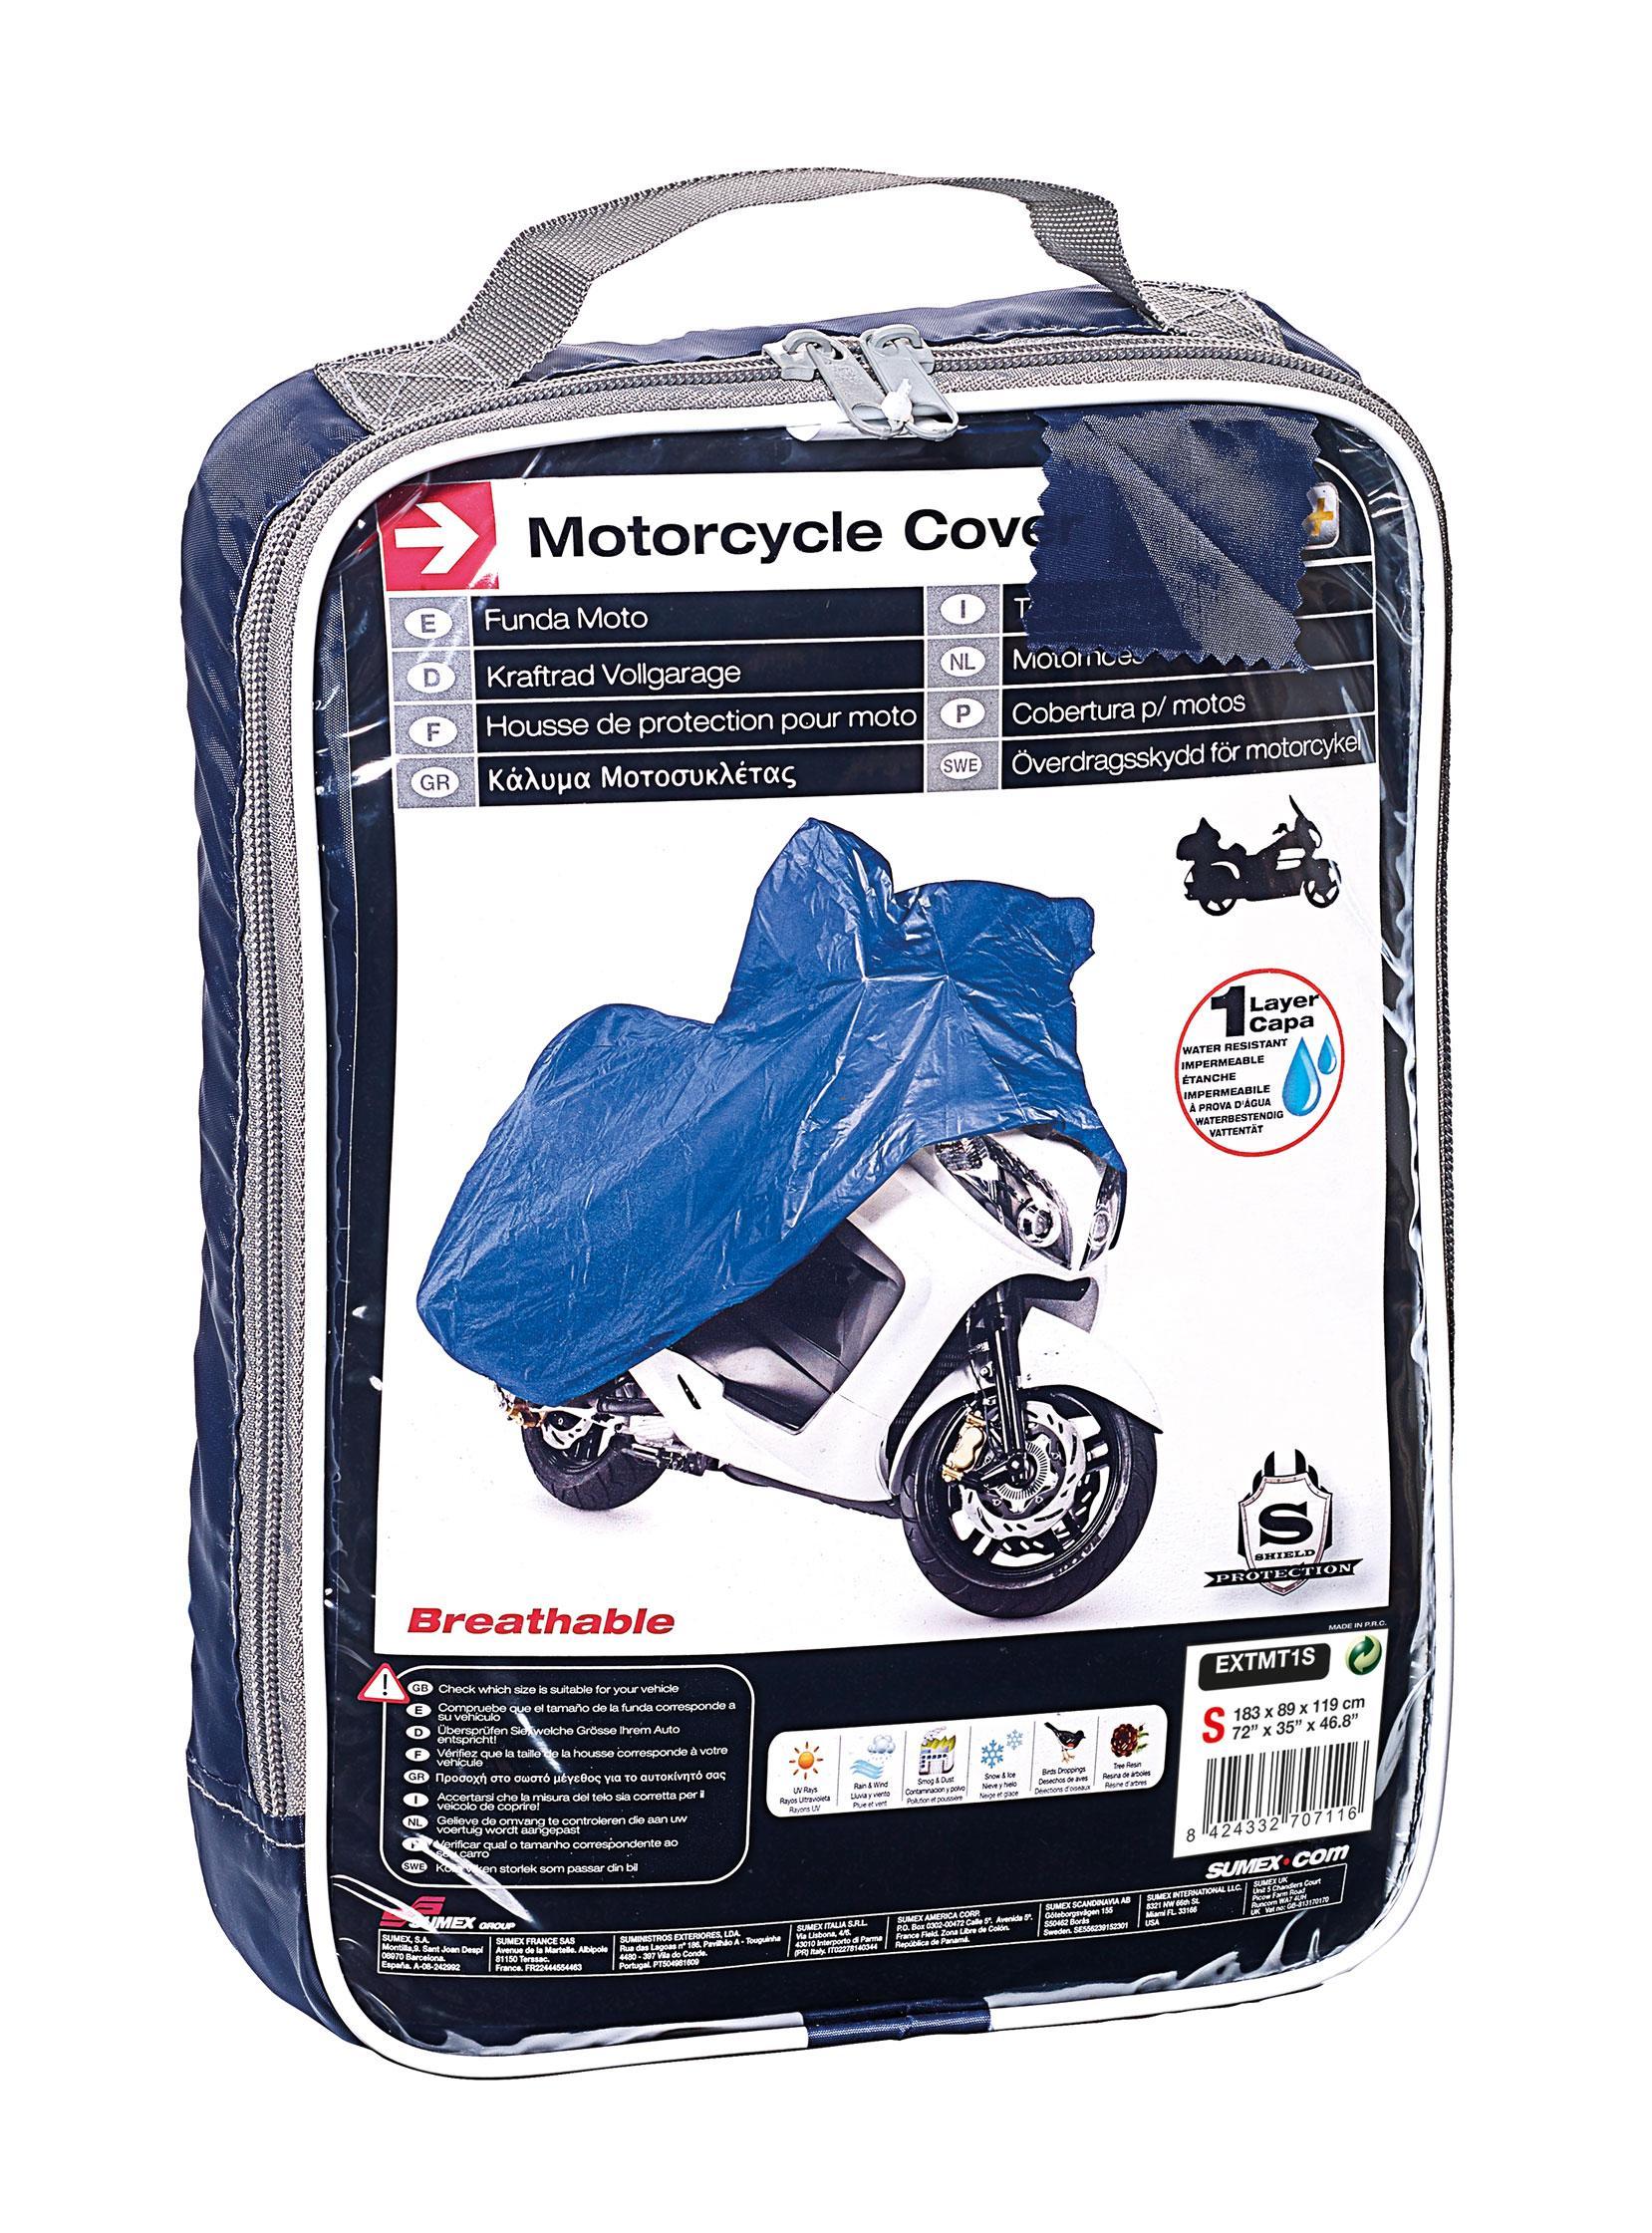 housses de protection adnautomid moto s 183x89x119. Black Bedroom Furniture Sets. Home Design Ideas